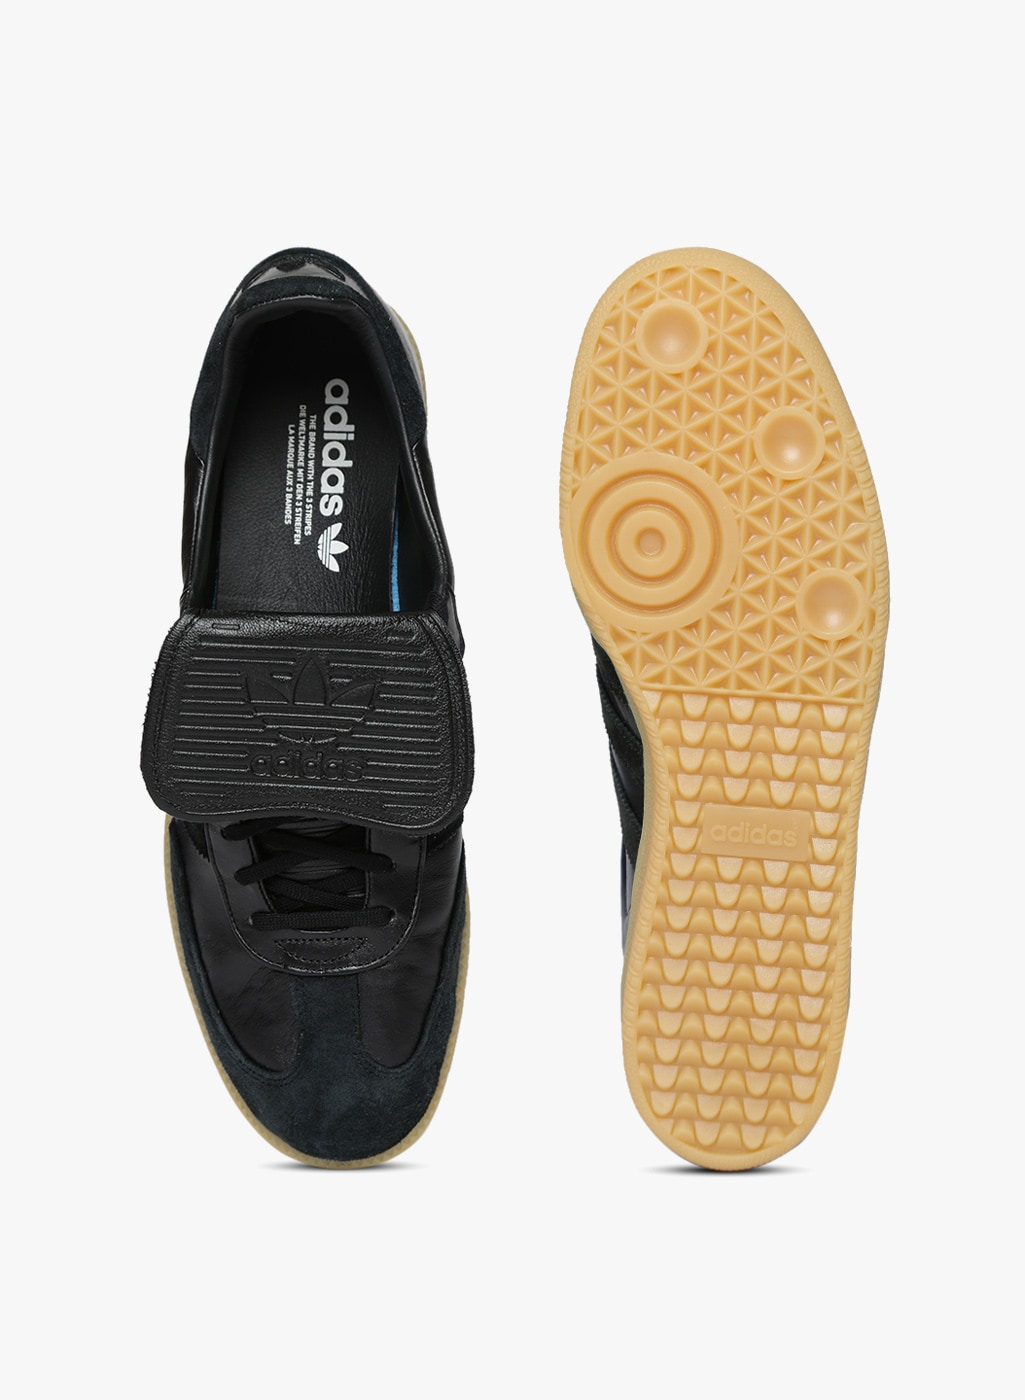 67d1bcea6 Adidas Originals - Buy Adidas Originals online in India - Jabong